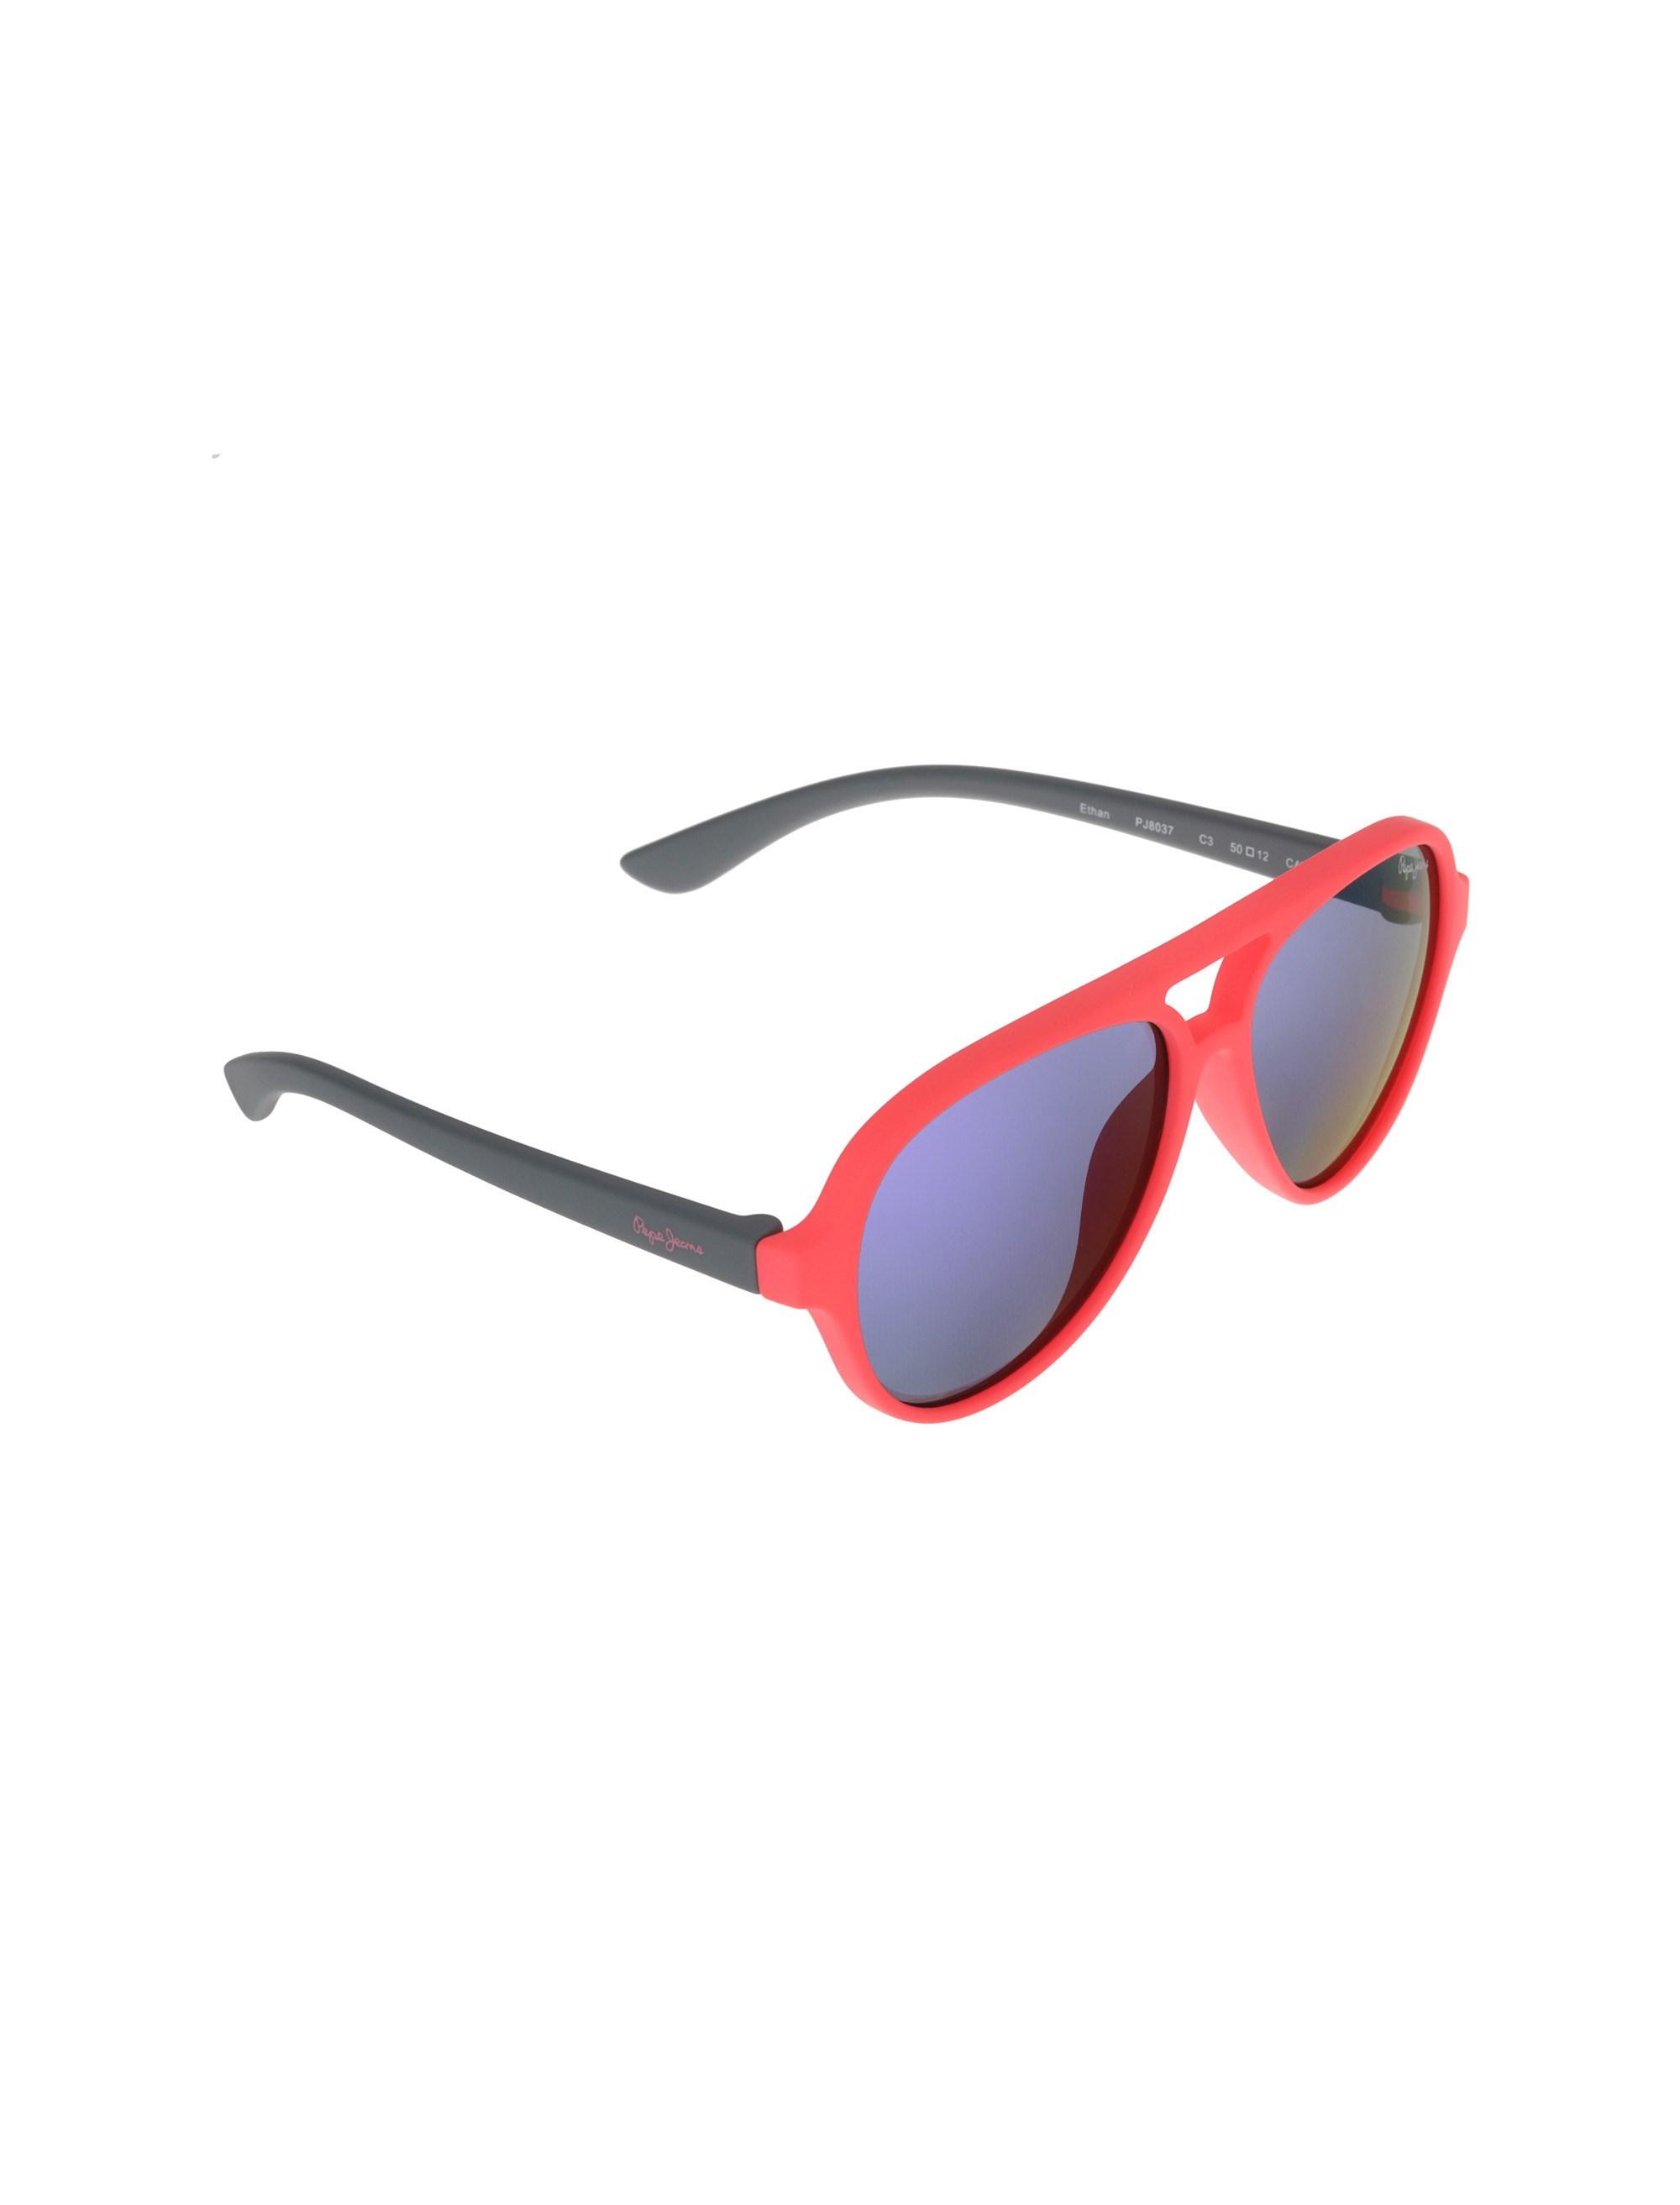 عینک آفتابی خلبانی بچگانه - طوسي و صورتي فسفري - 2